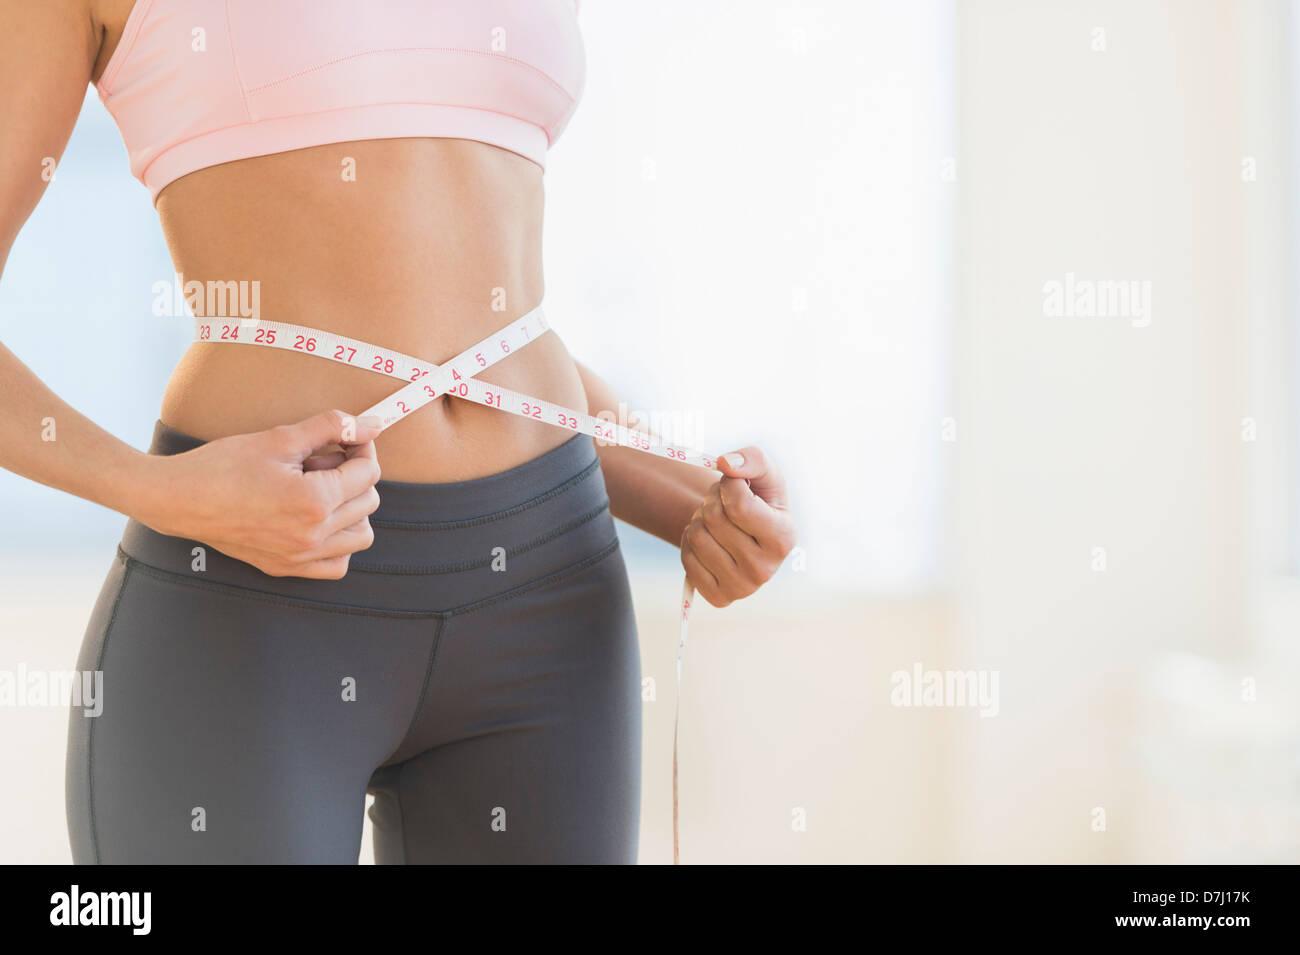 Woman measuring waist Photo Stock